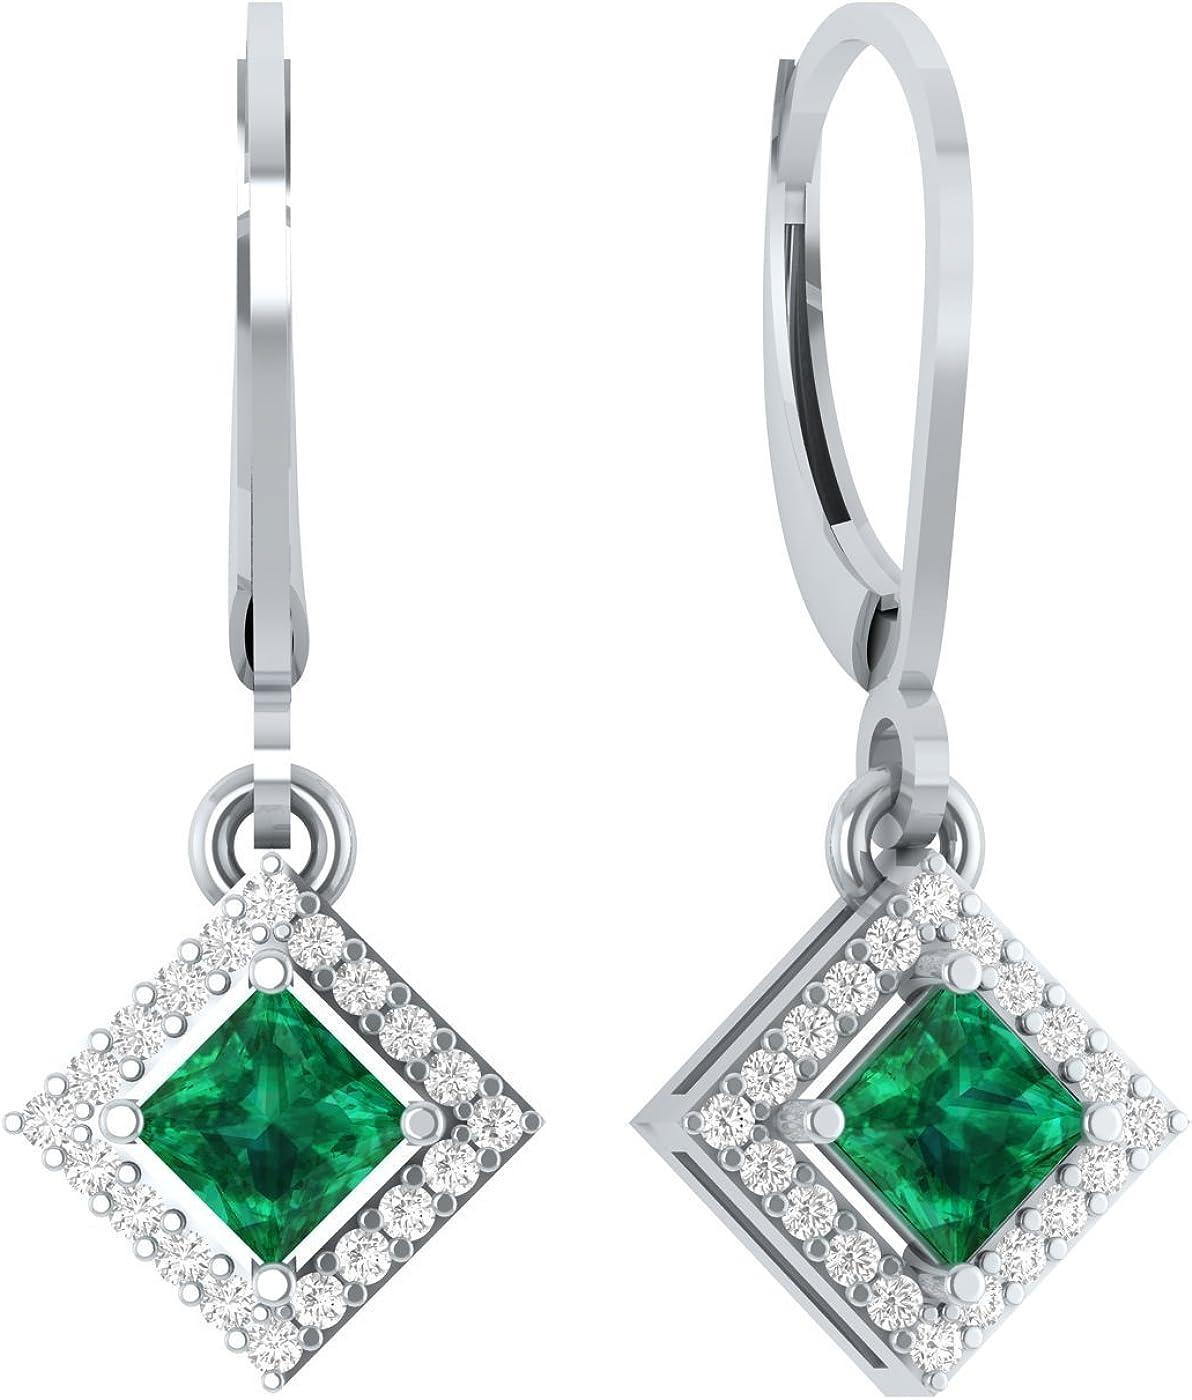 Silverraj Jewels 14K Gold Plated Simulated Diamond Studded Designer Hoop Earrings